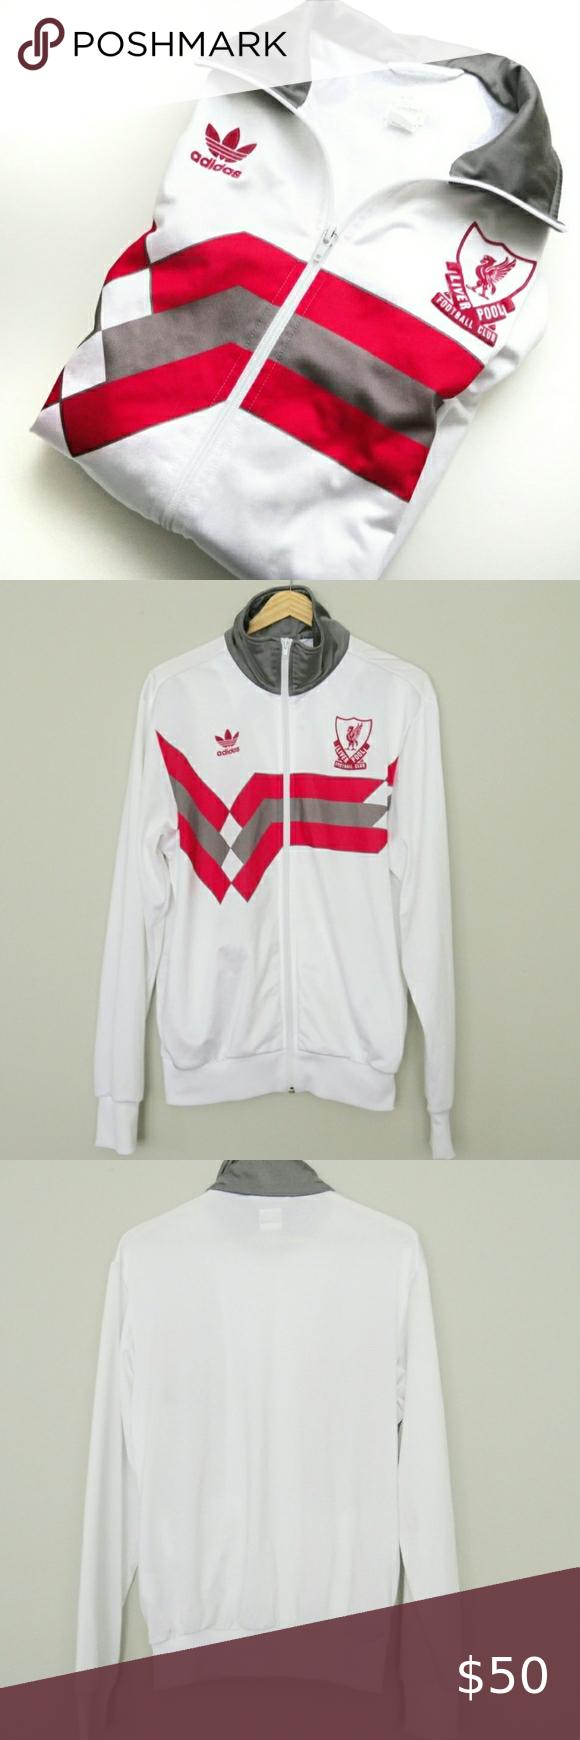 Vintage Liverpool Football Club Track Jacket In 2020 Track Jackets Clothes Design Liverpool Football [ 1740 x 580 Pixel ]